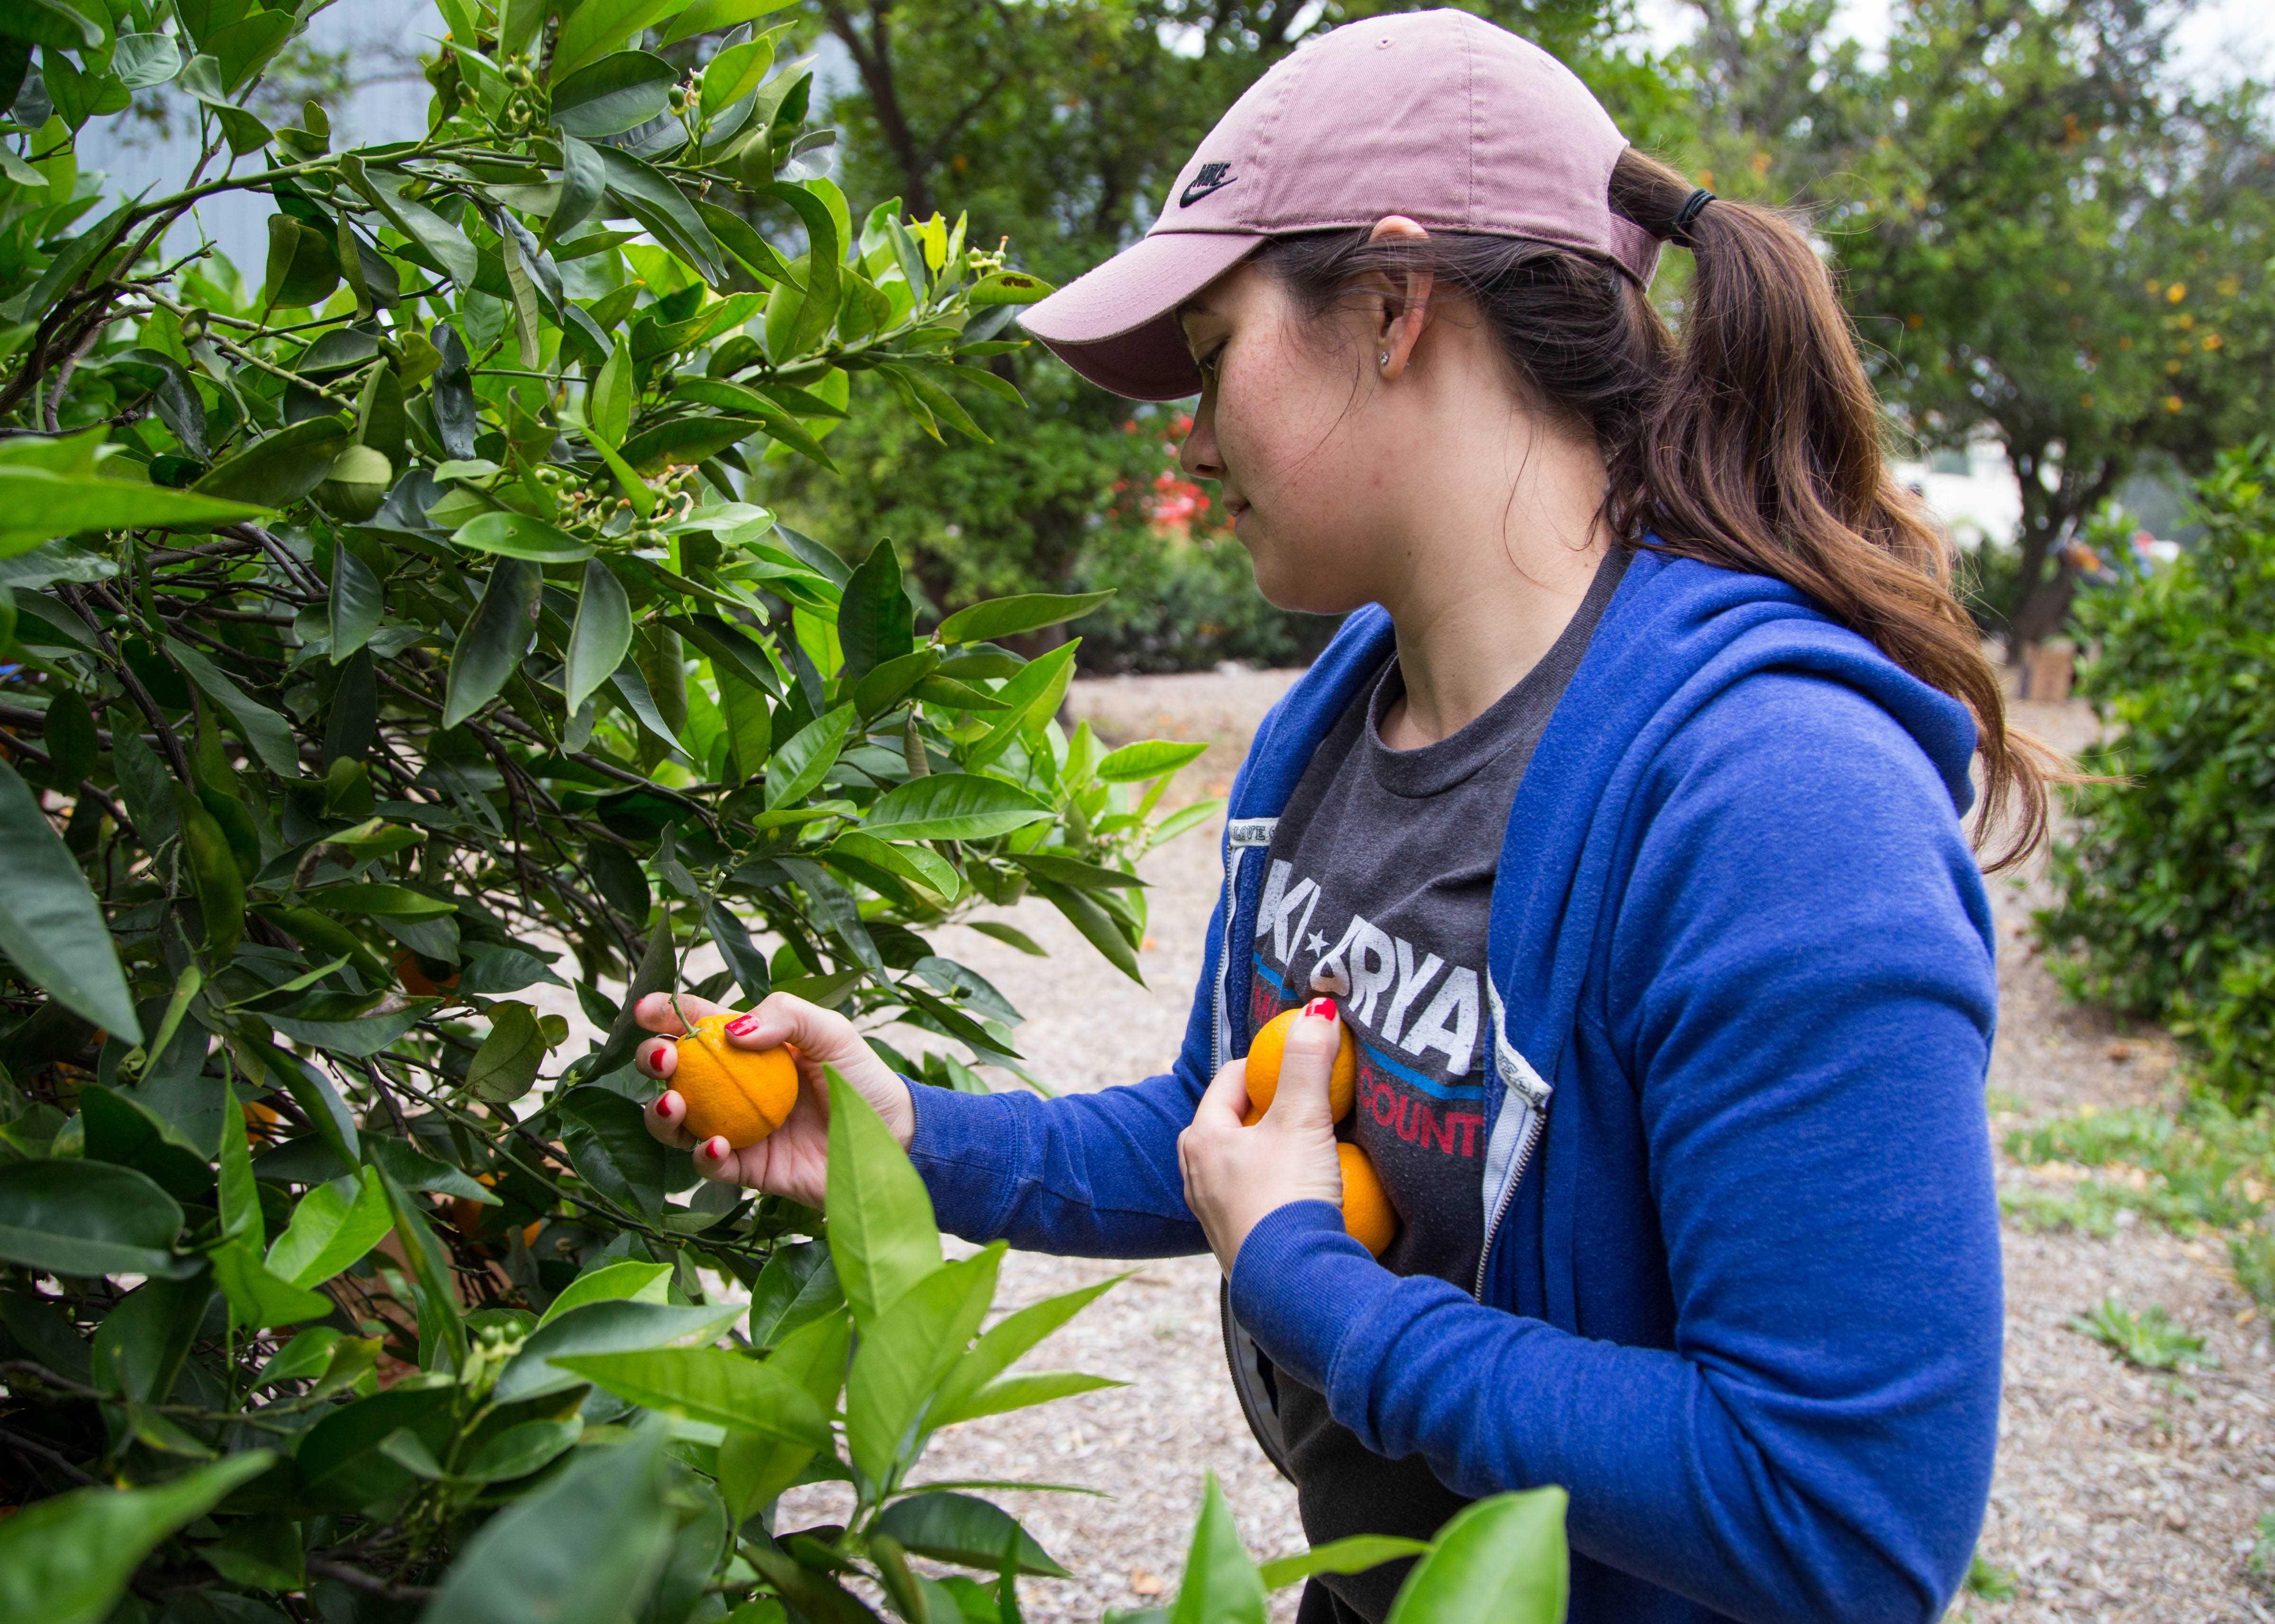 A volunteer picks oranges from the Orange Grove during the CSUN Sustainability Spring Orange Pick on April 28. Photo credit: John Hernandez